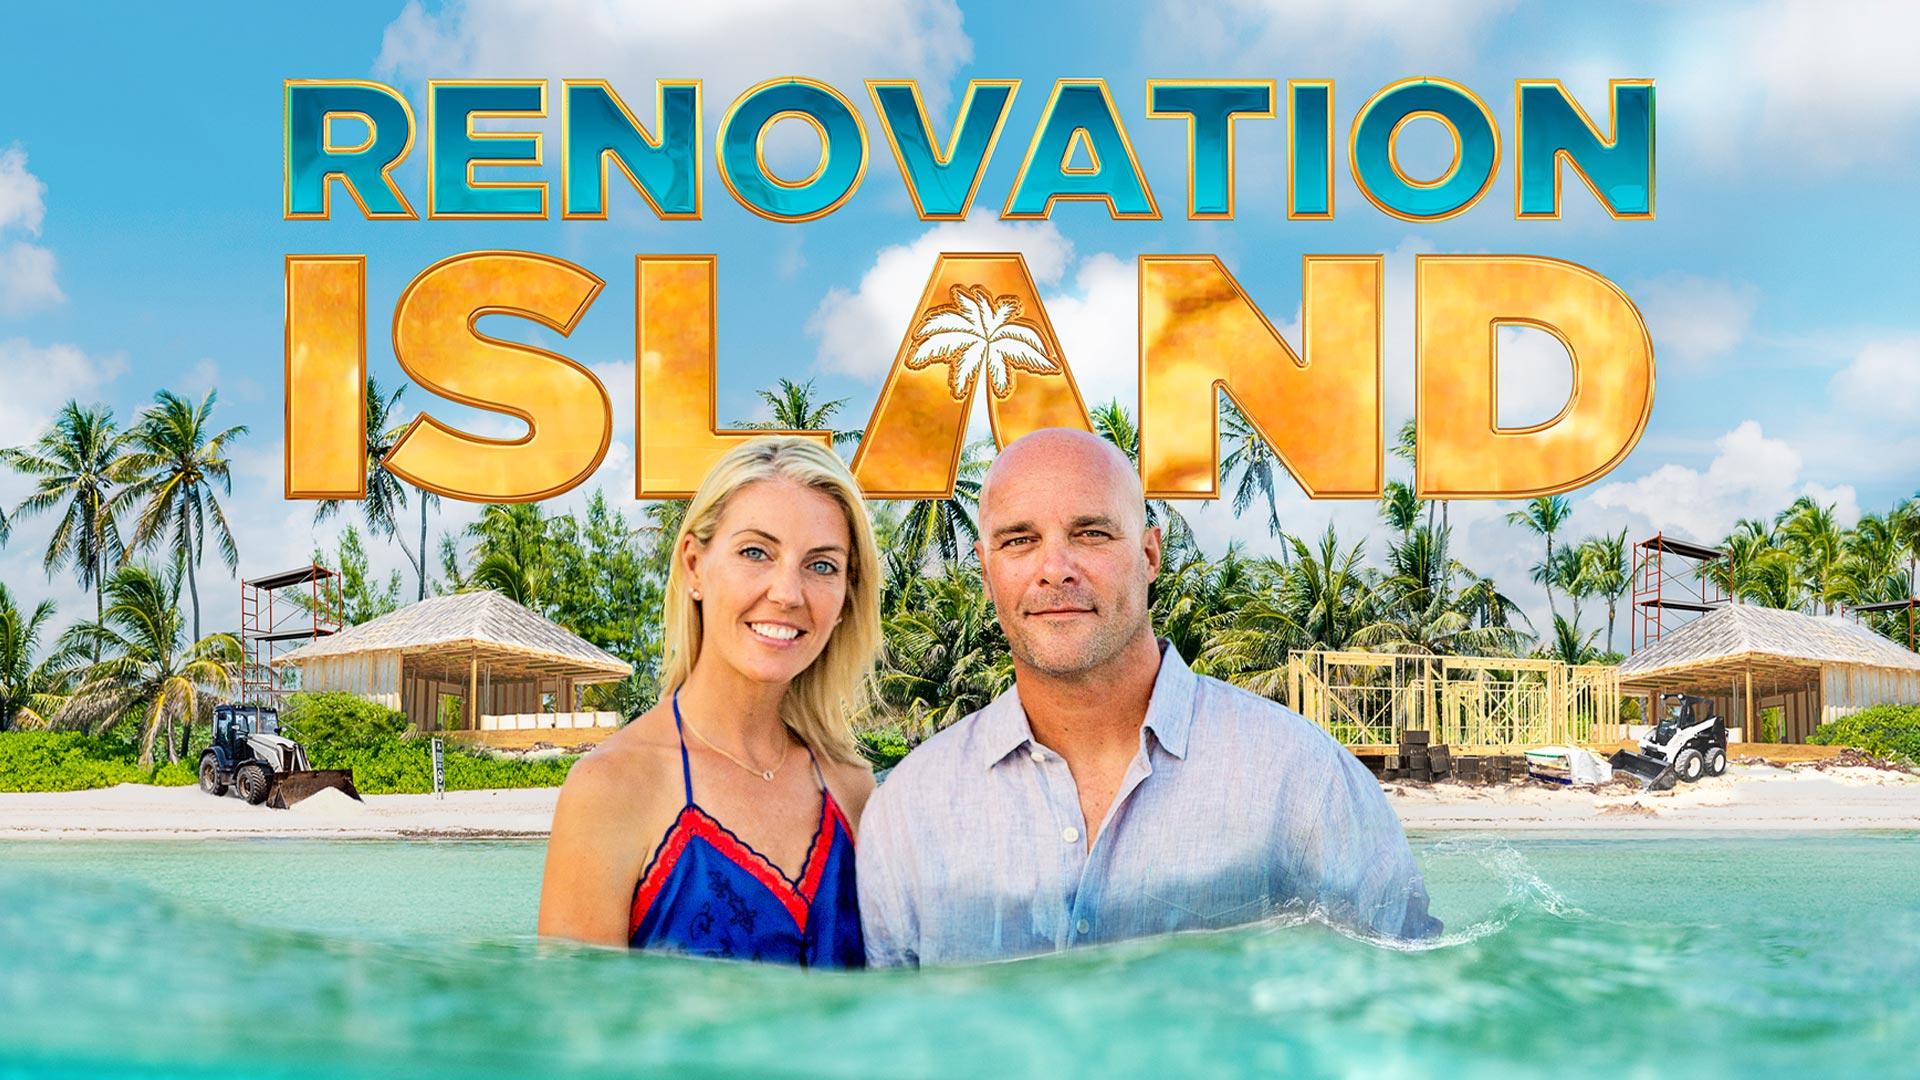 Renovation Island, Season 1